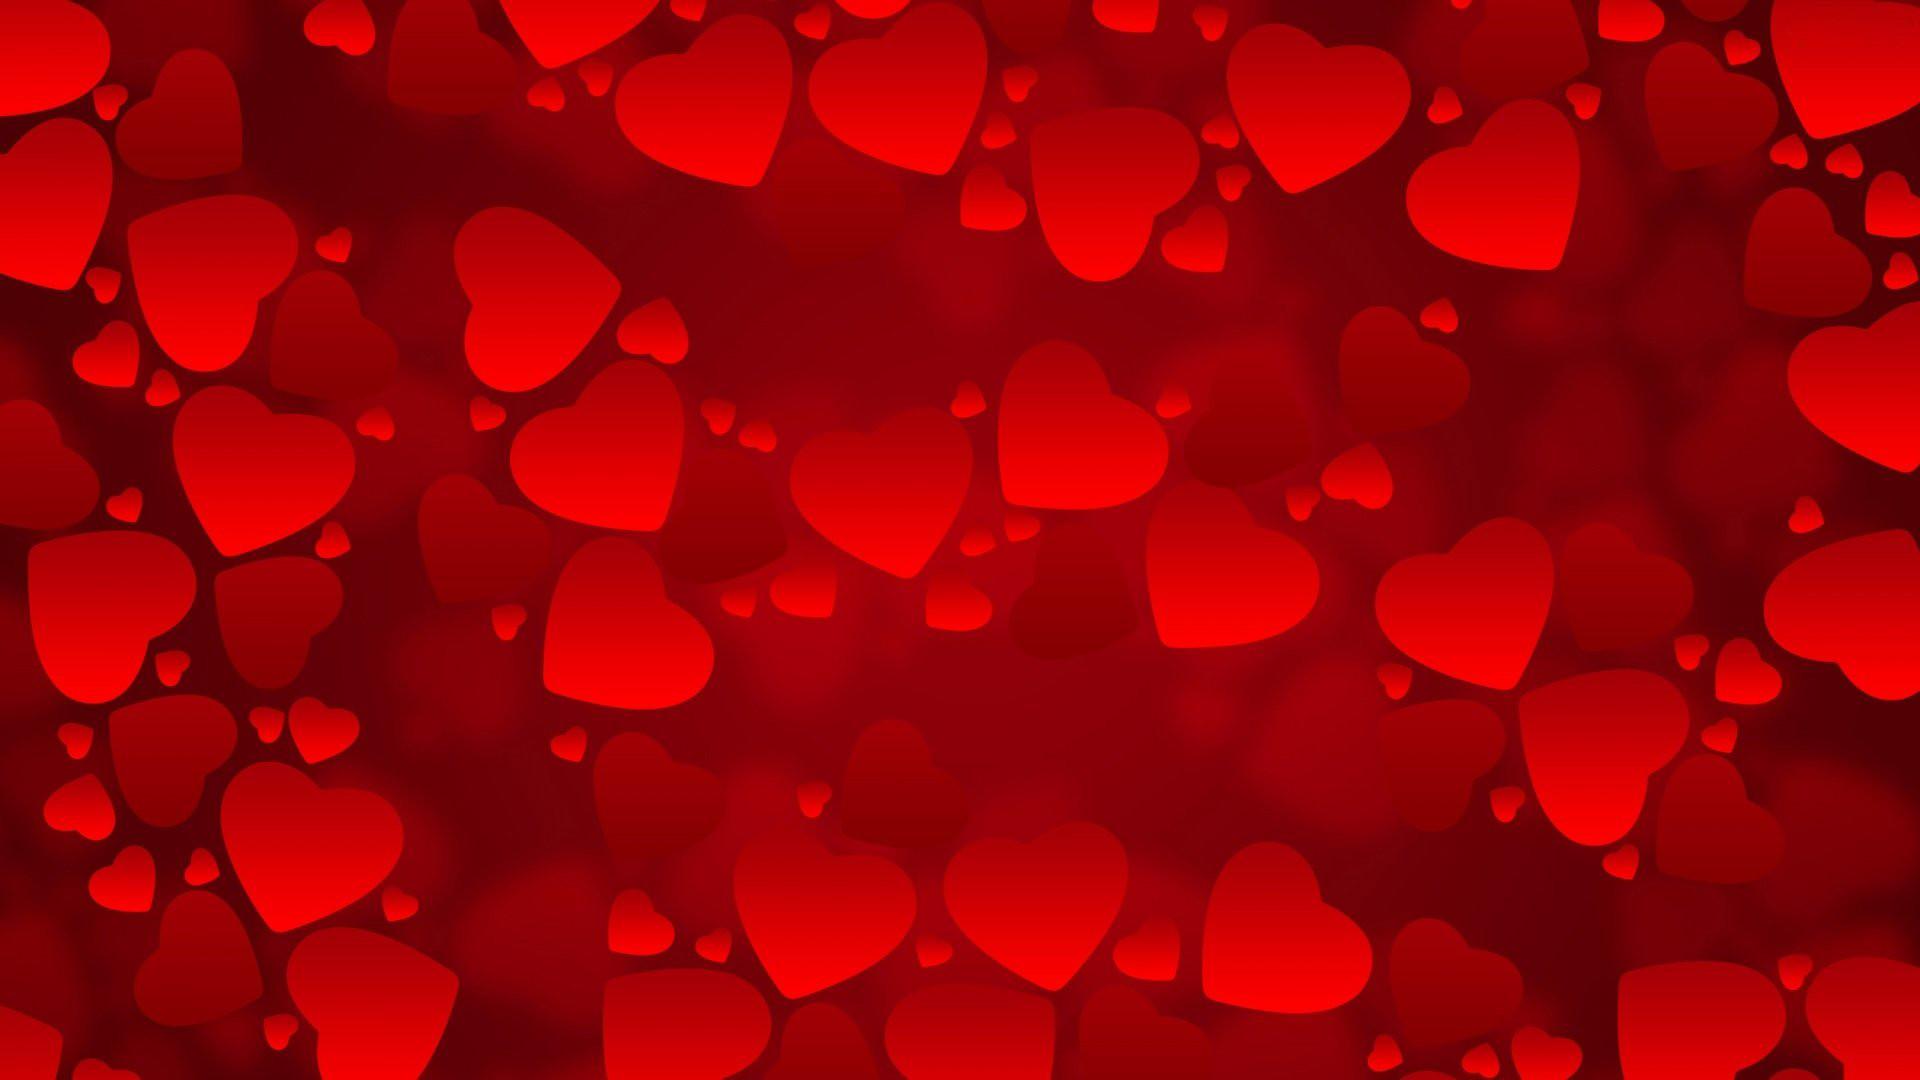 HD download valentines day wallpaper.